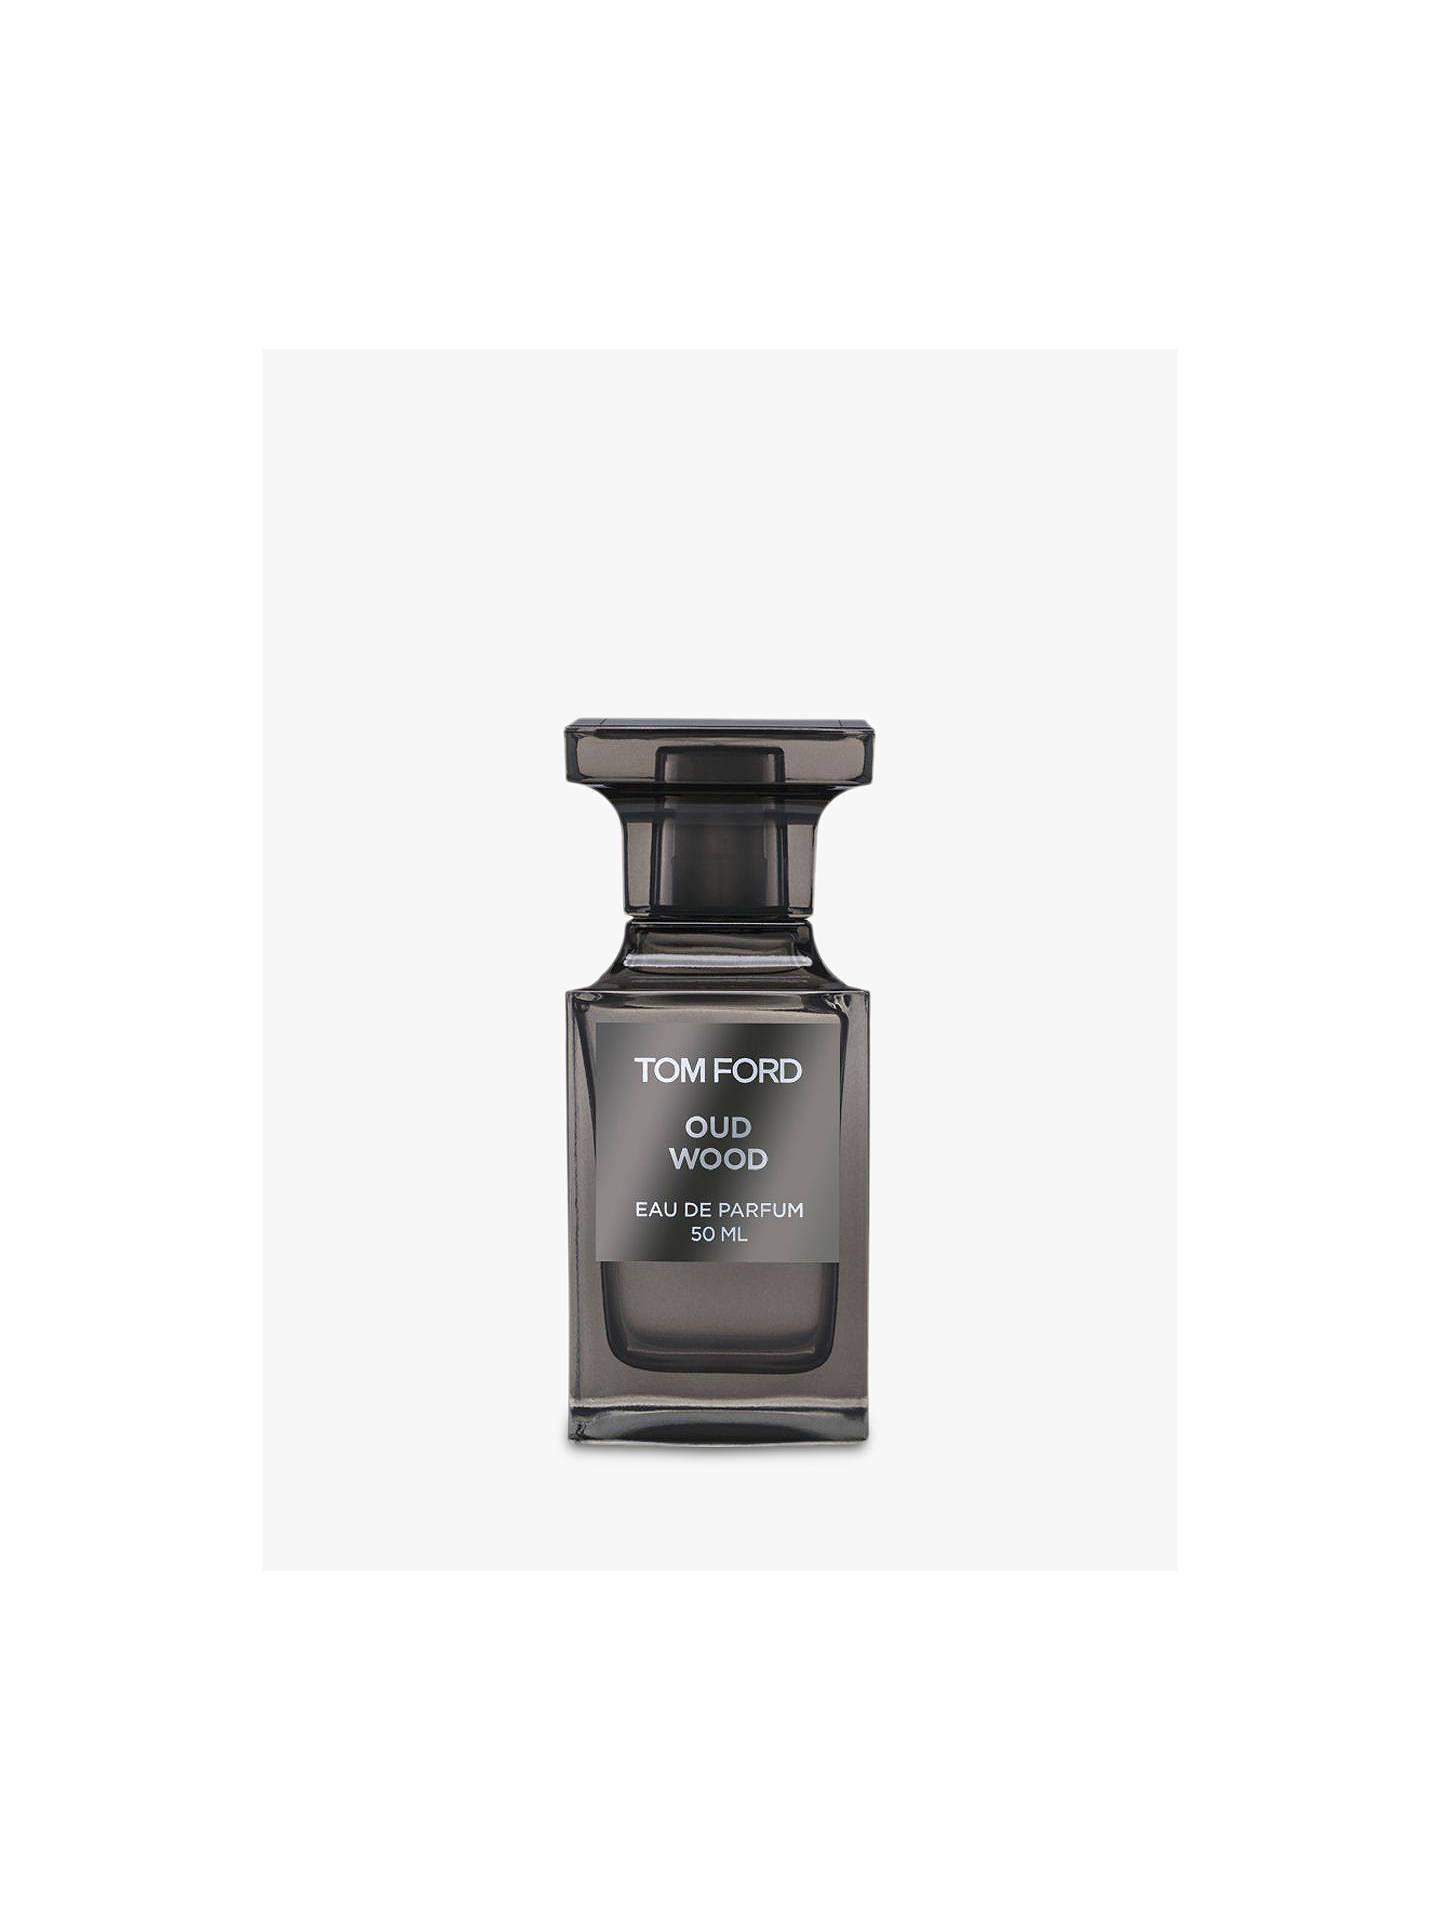 tom ford private blend oud wood eau de parfum 50ml at. Black Bedroom Furniture Sets. Home Design Ideas